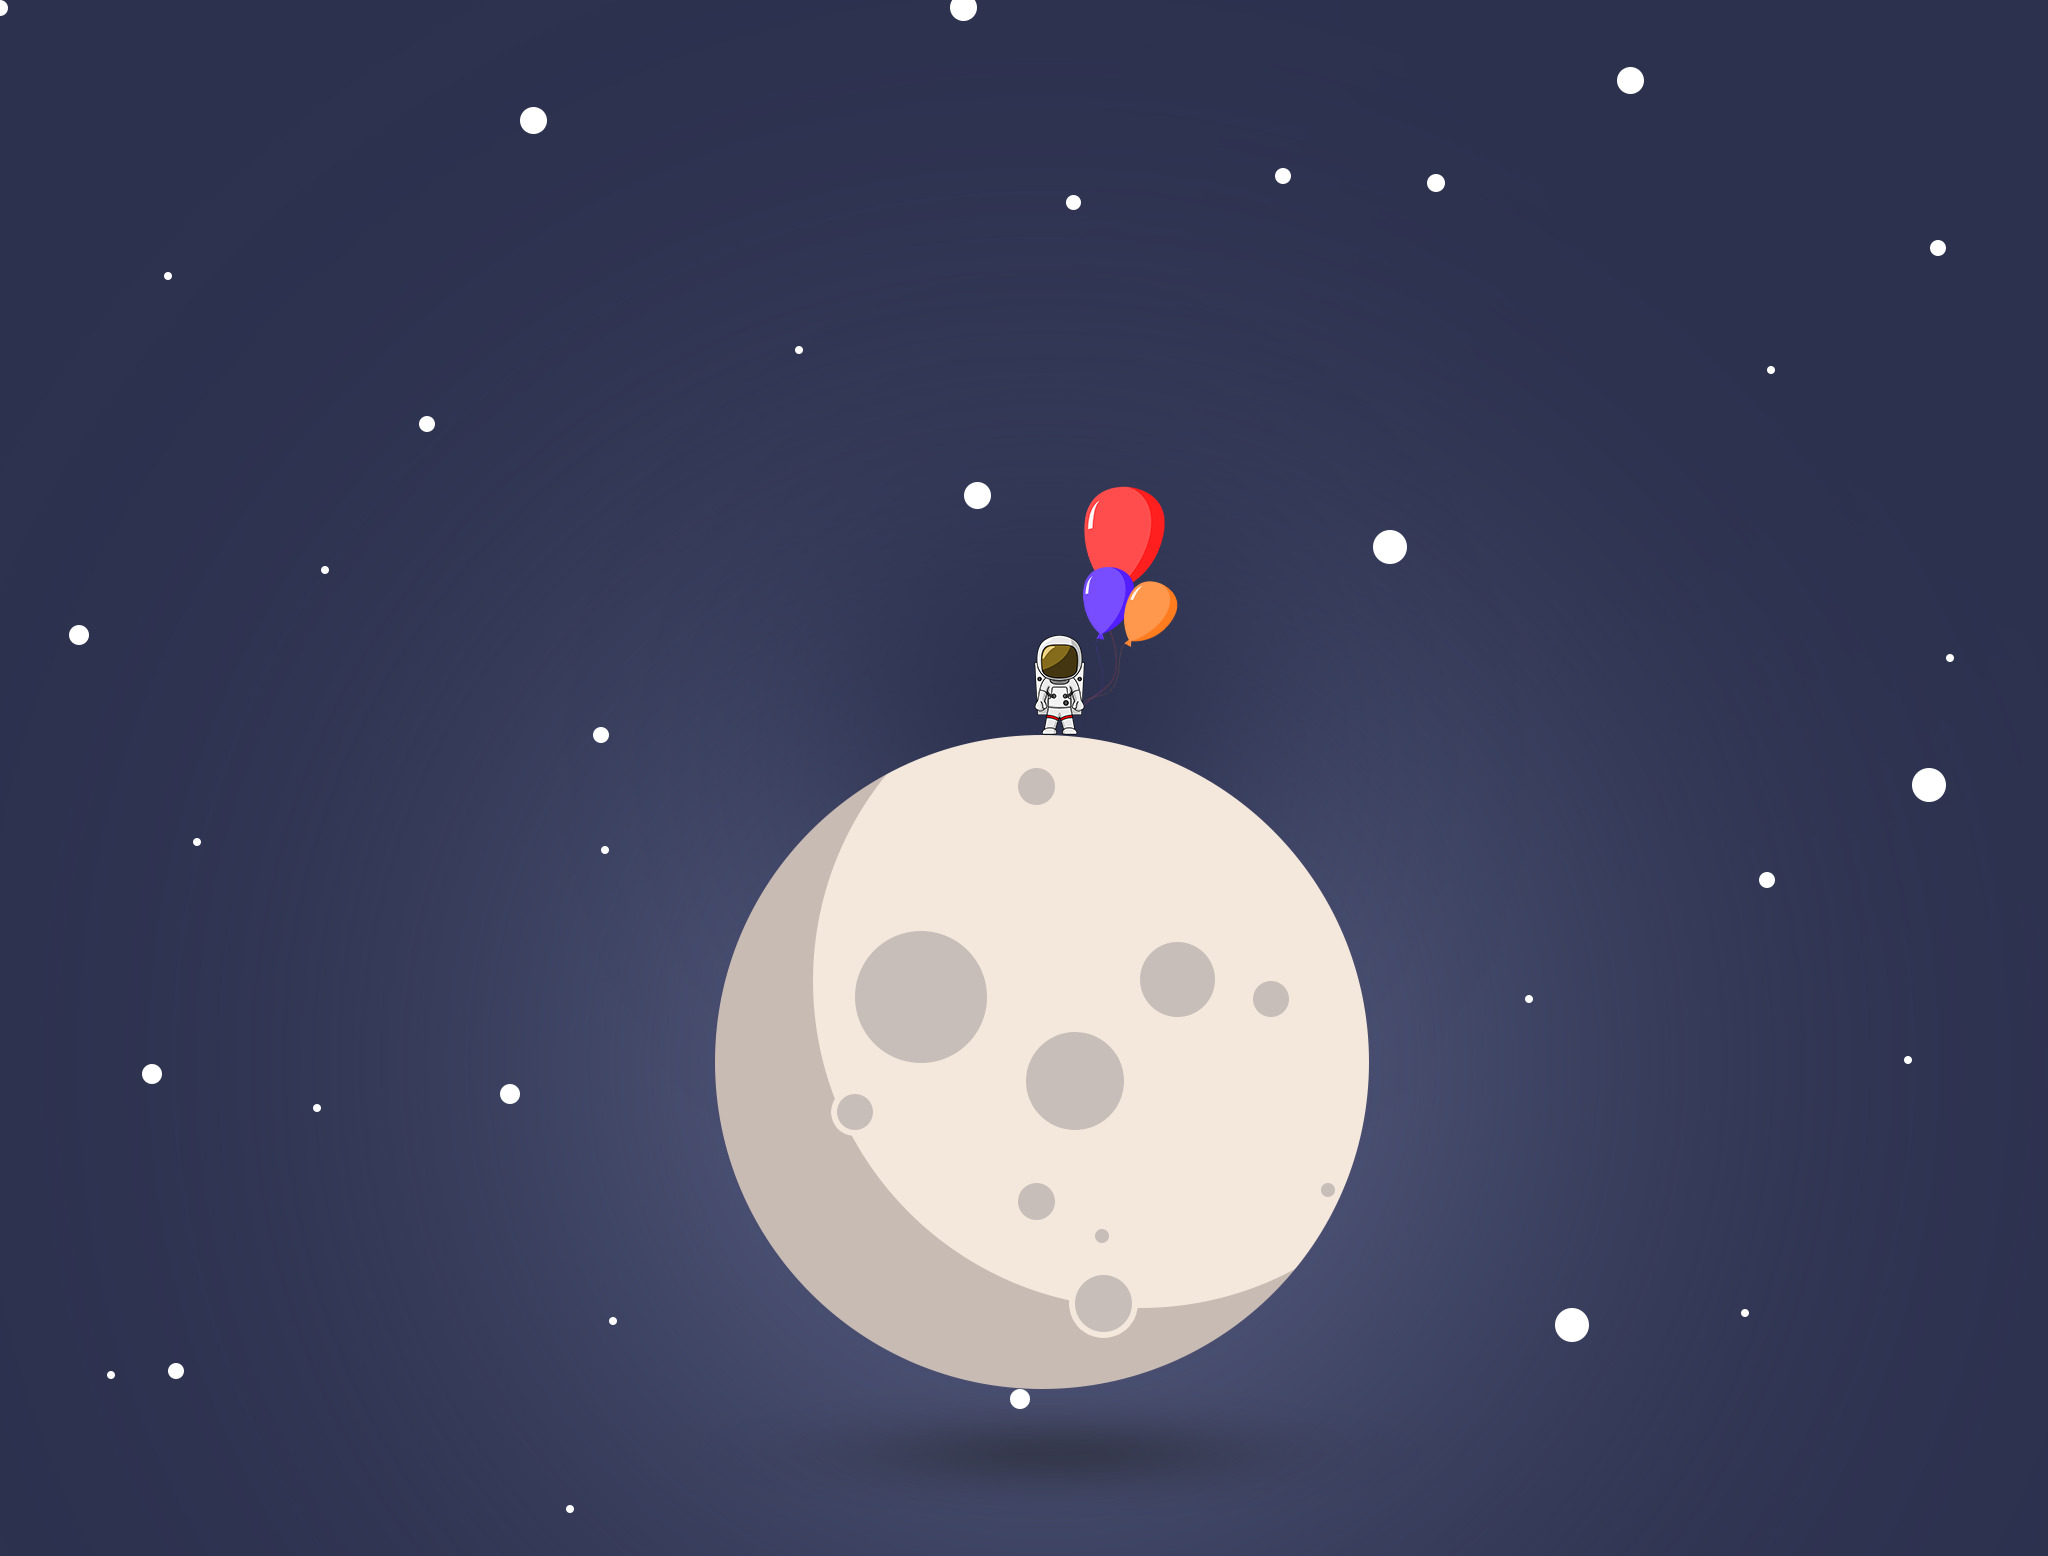 Minimalist Cute Mobile Wallpaper Astronaut Space Illustration Blue Moon White Ball